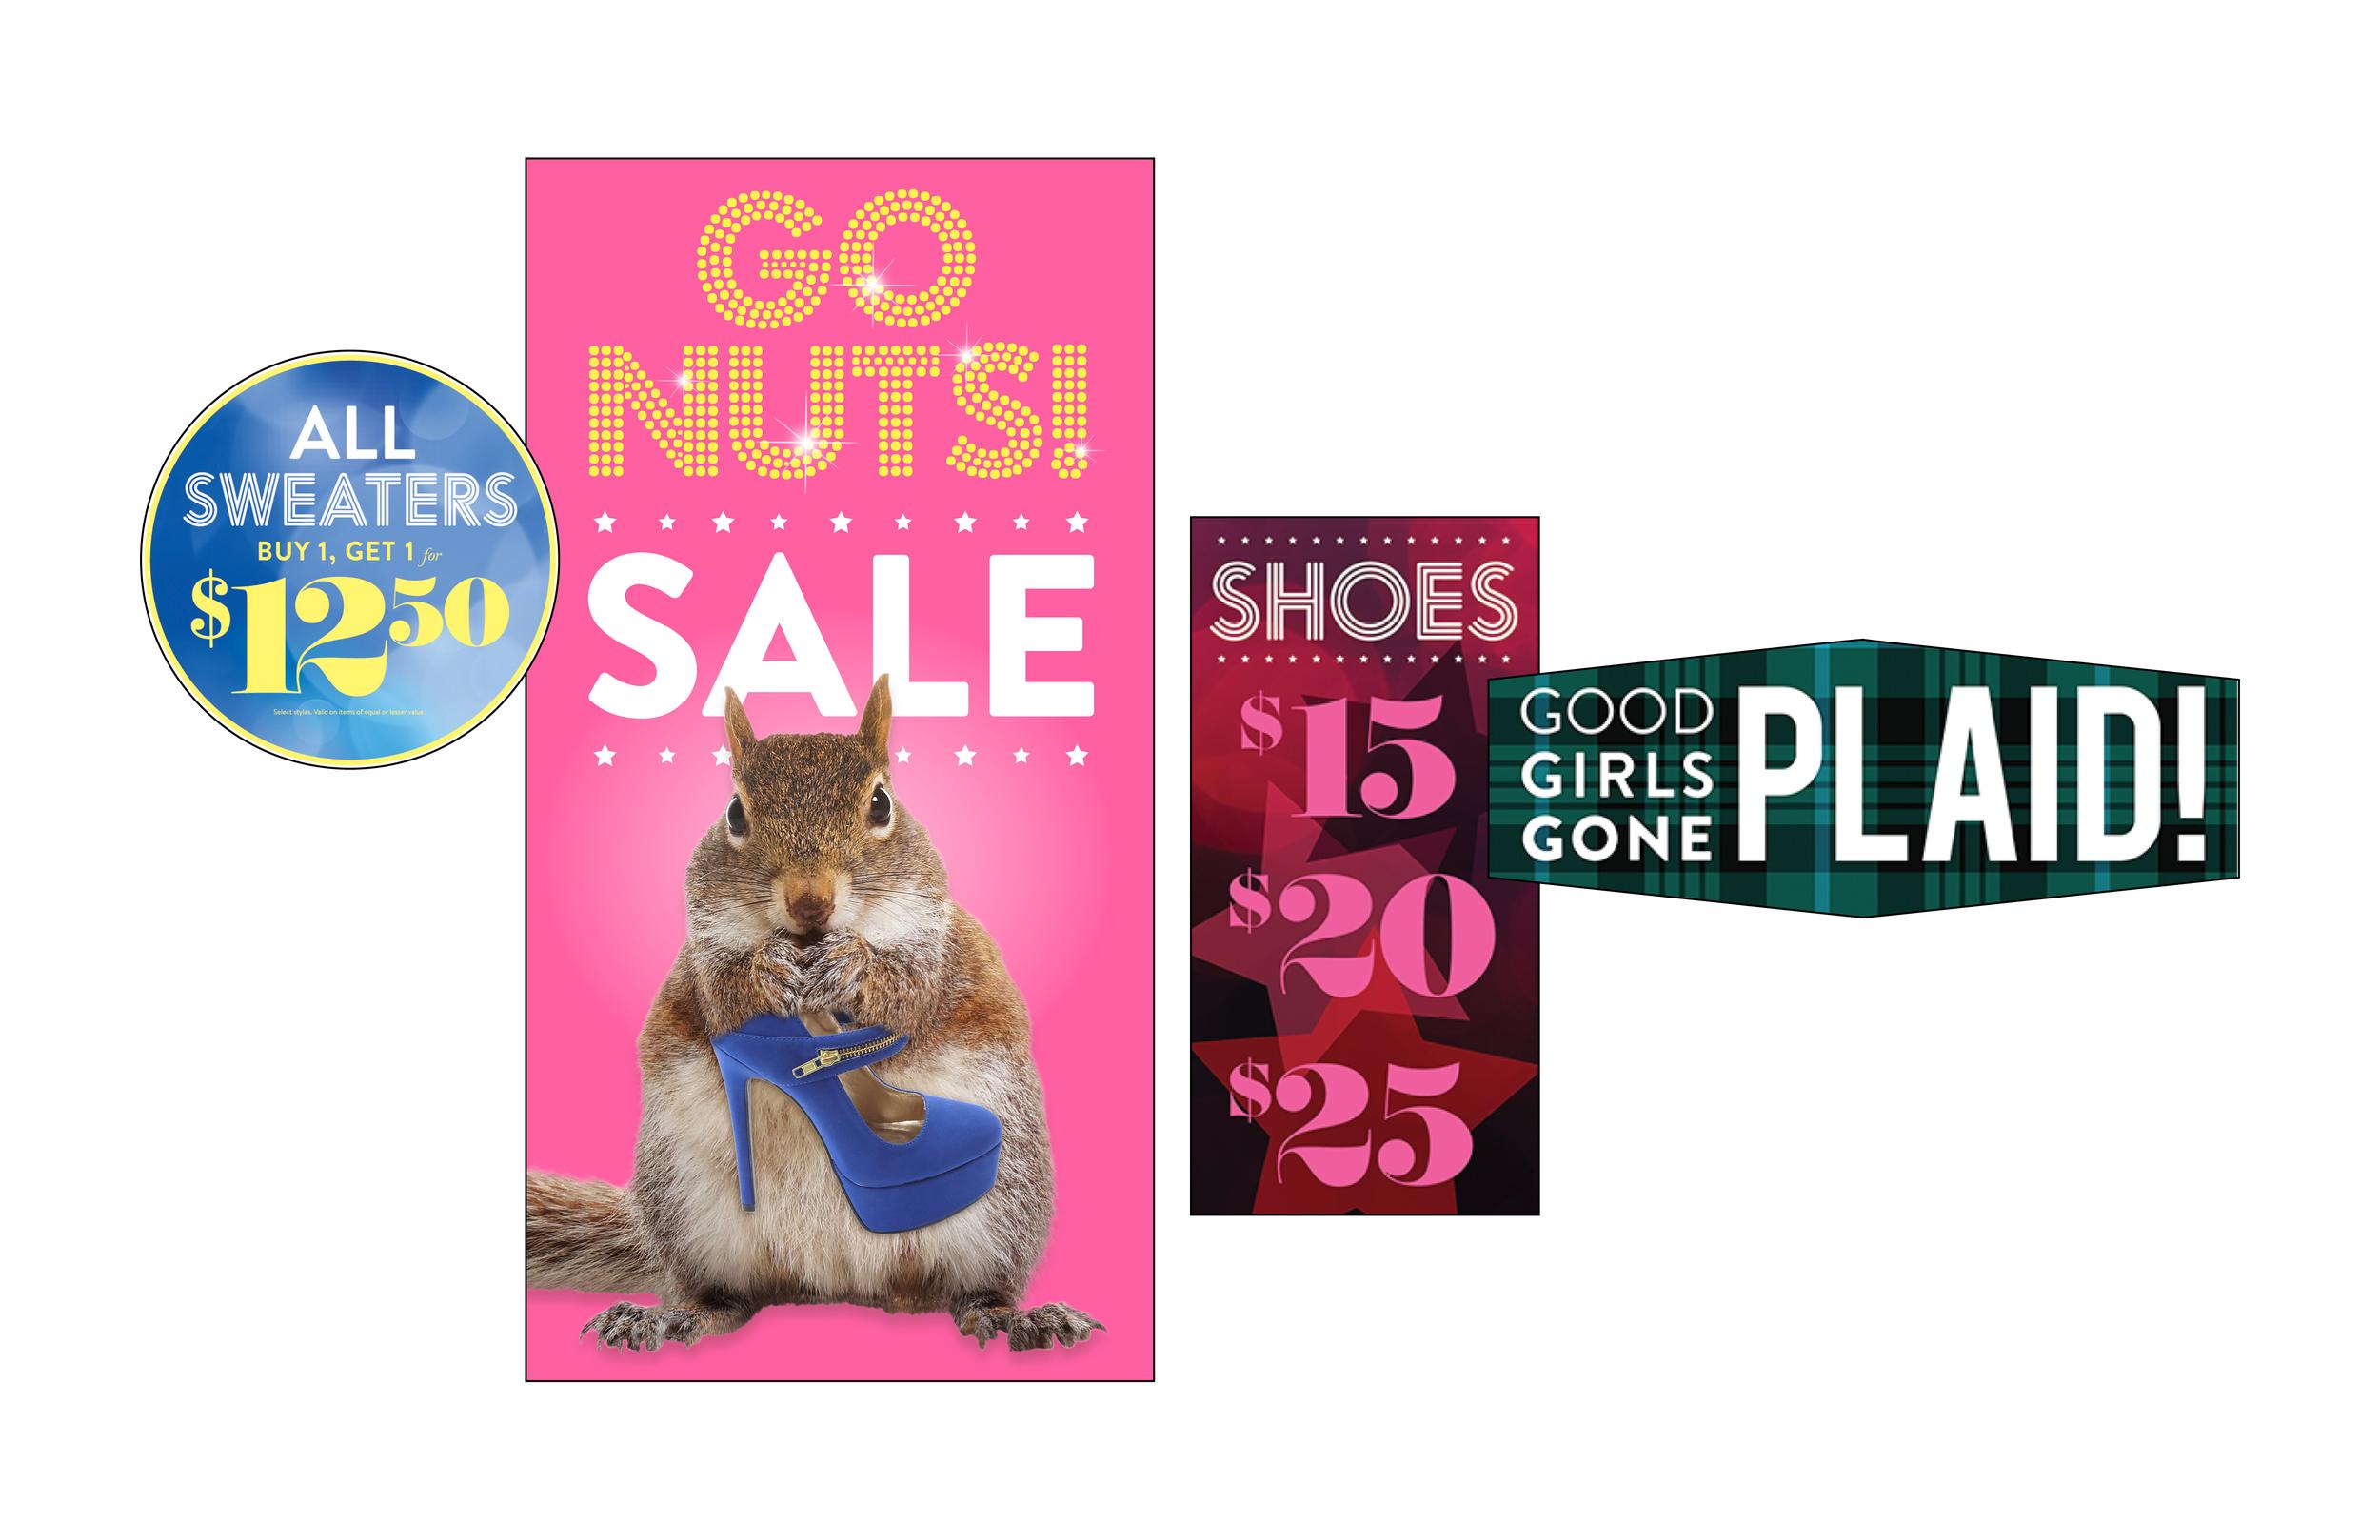 cr_go_nuts_signage-layout.jpg